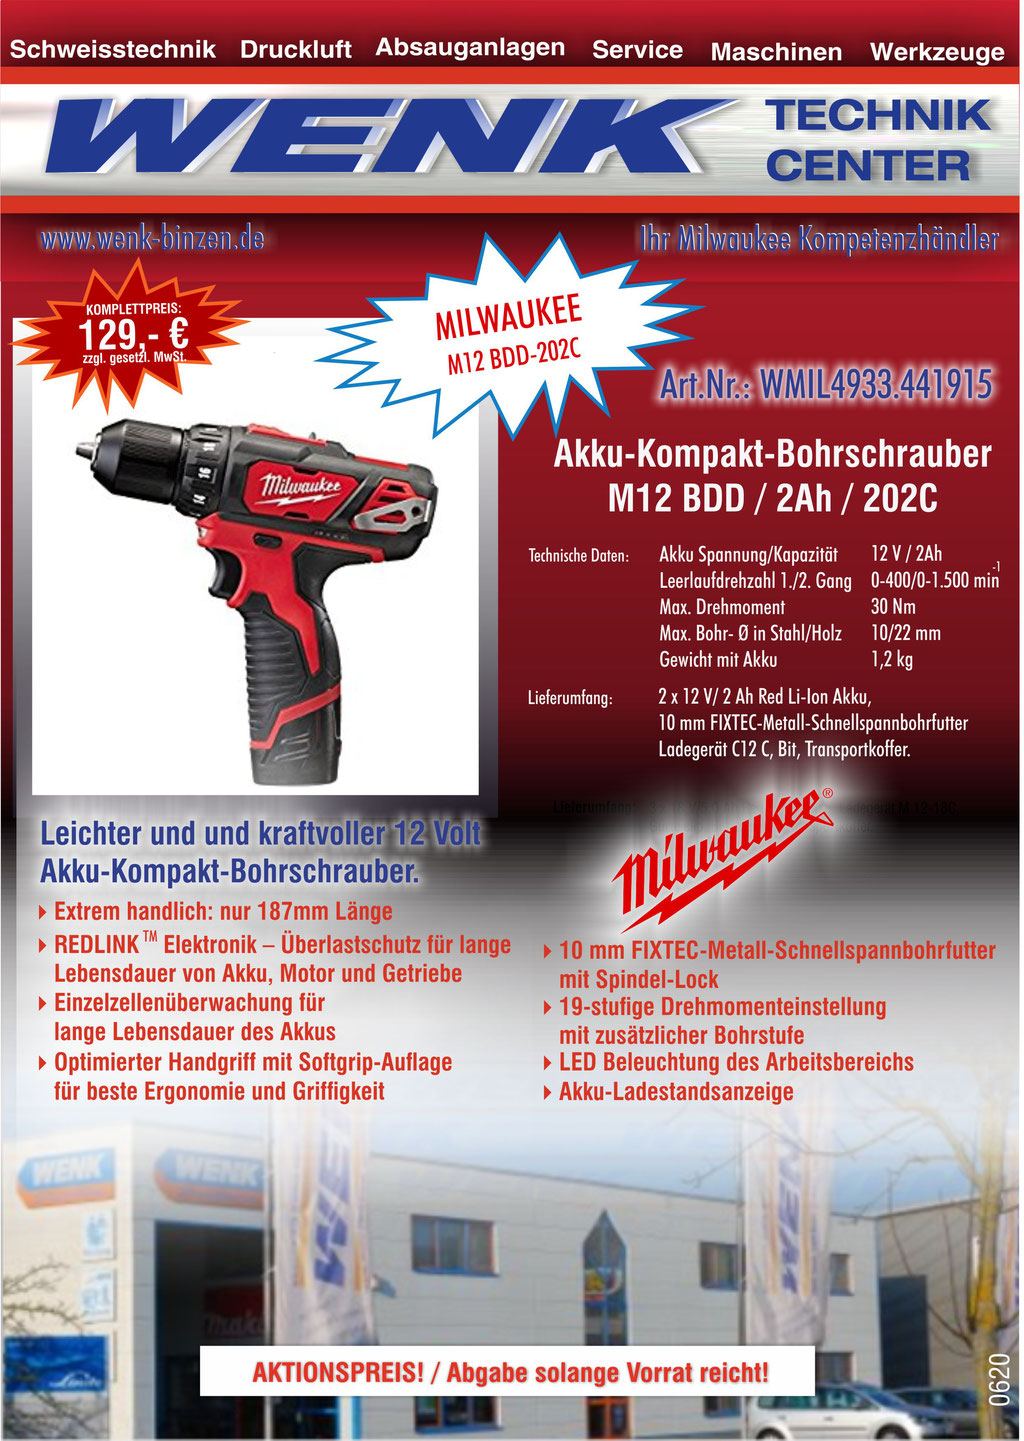 WENK SCHWEISSTECHNIK TOP ANGEBOT, Milwaukee Akku-Kompakt-Bohrschrauber M12 BDD, Aktionspreis 129,- EUR